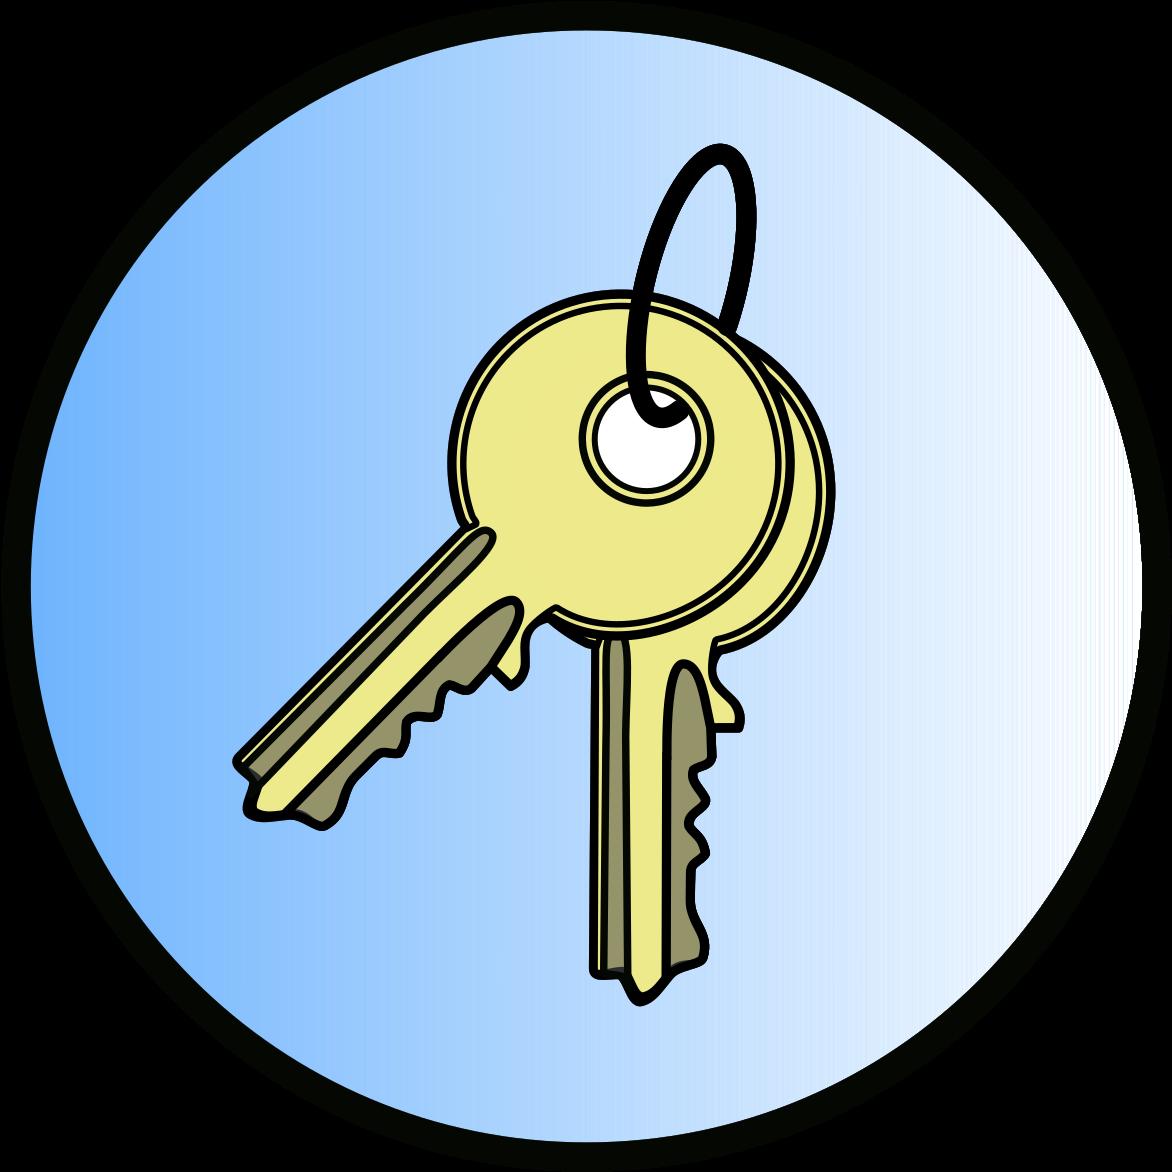 Transparent cartoon jing fm. Keys clipart two key